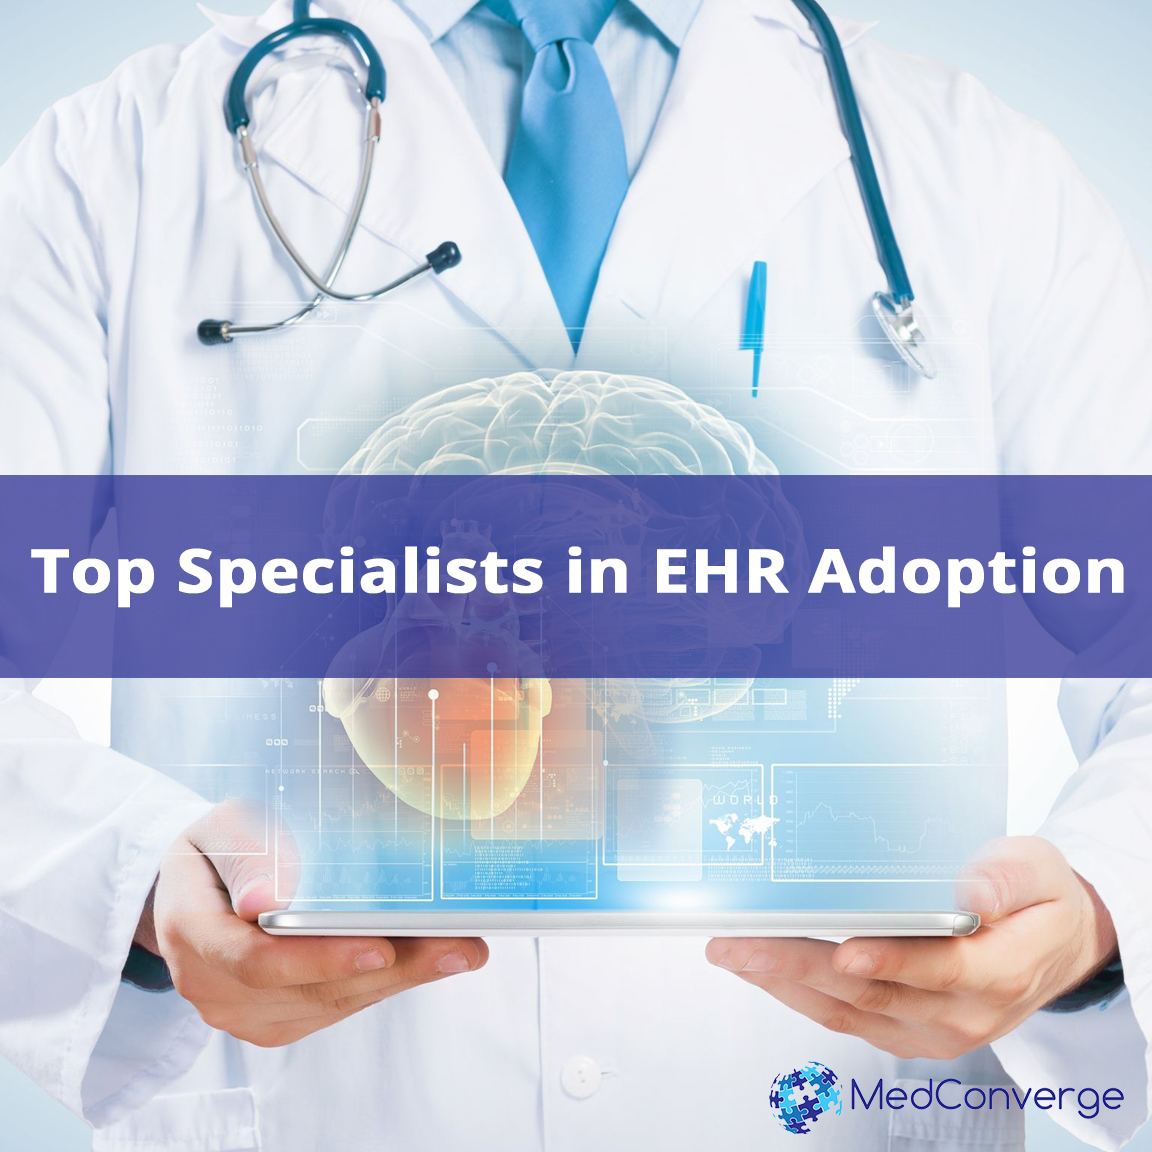 EHR Adoption Cardiologists